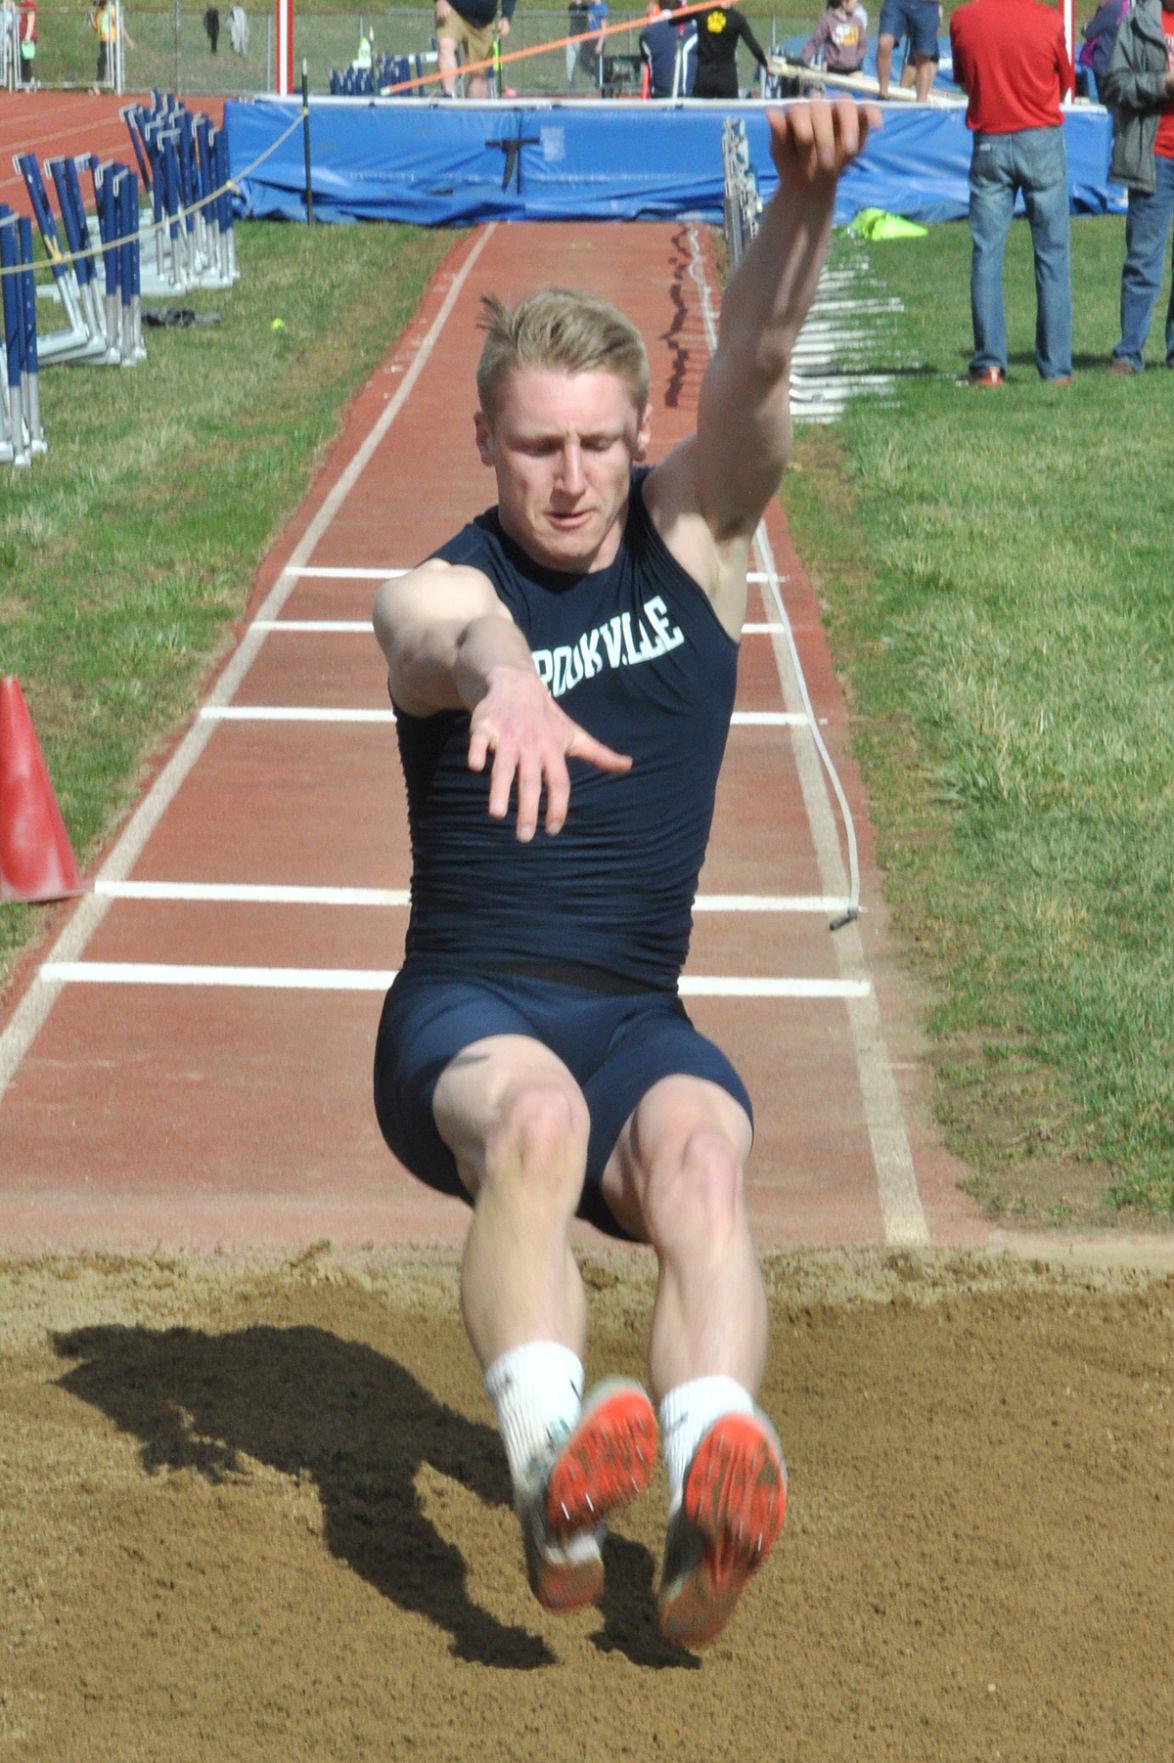 Bryan Dworek long jump